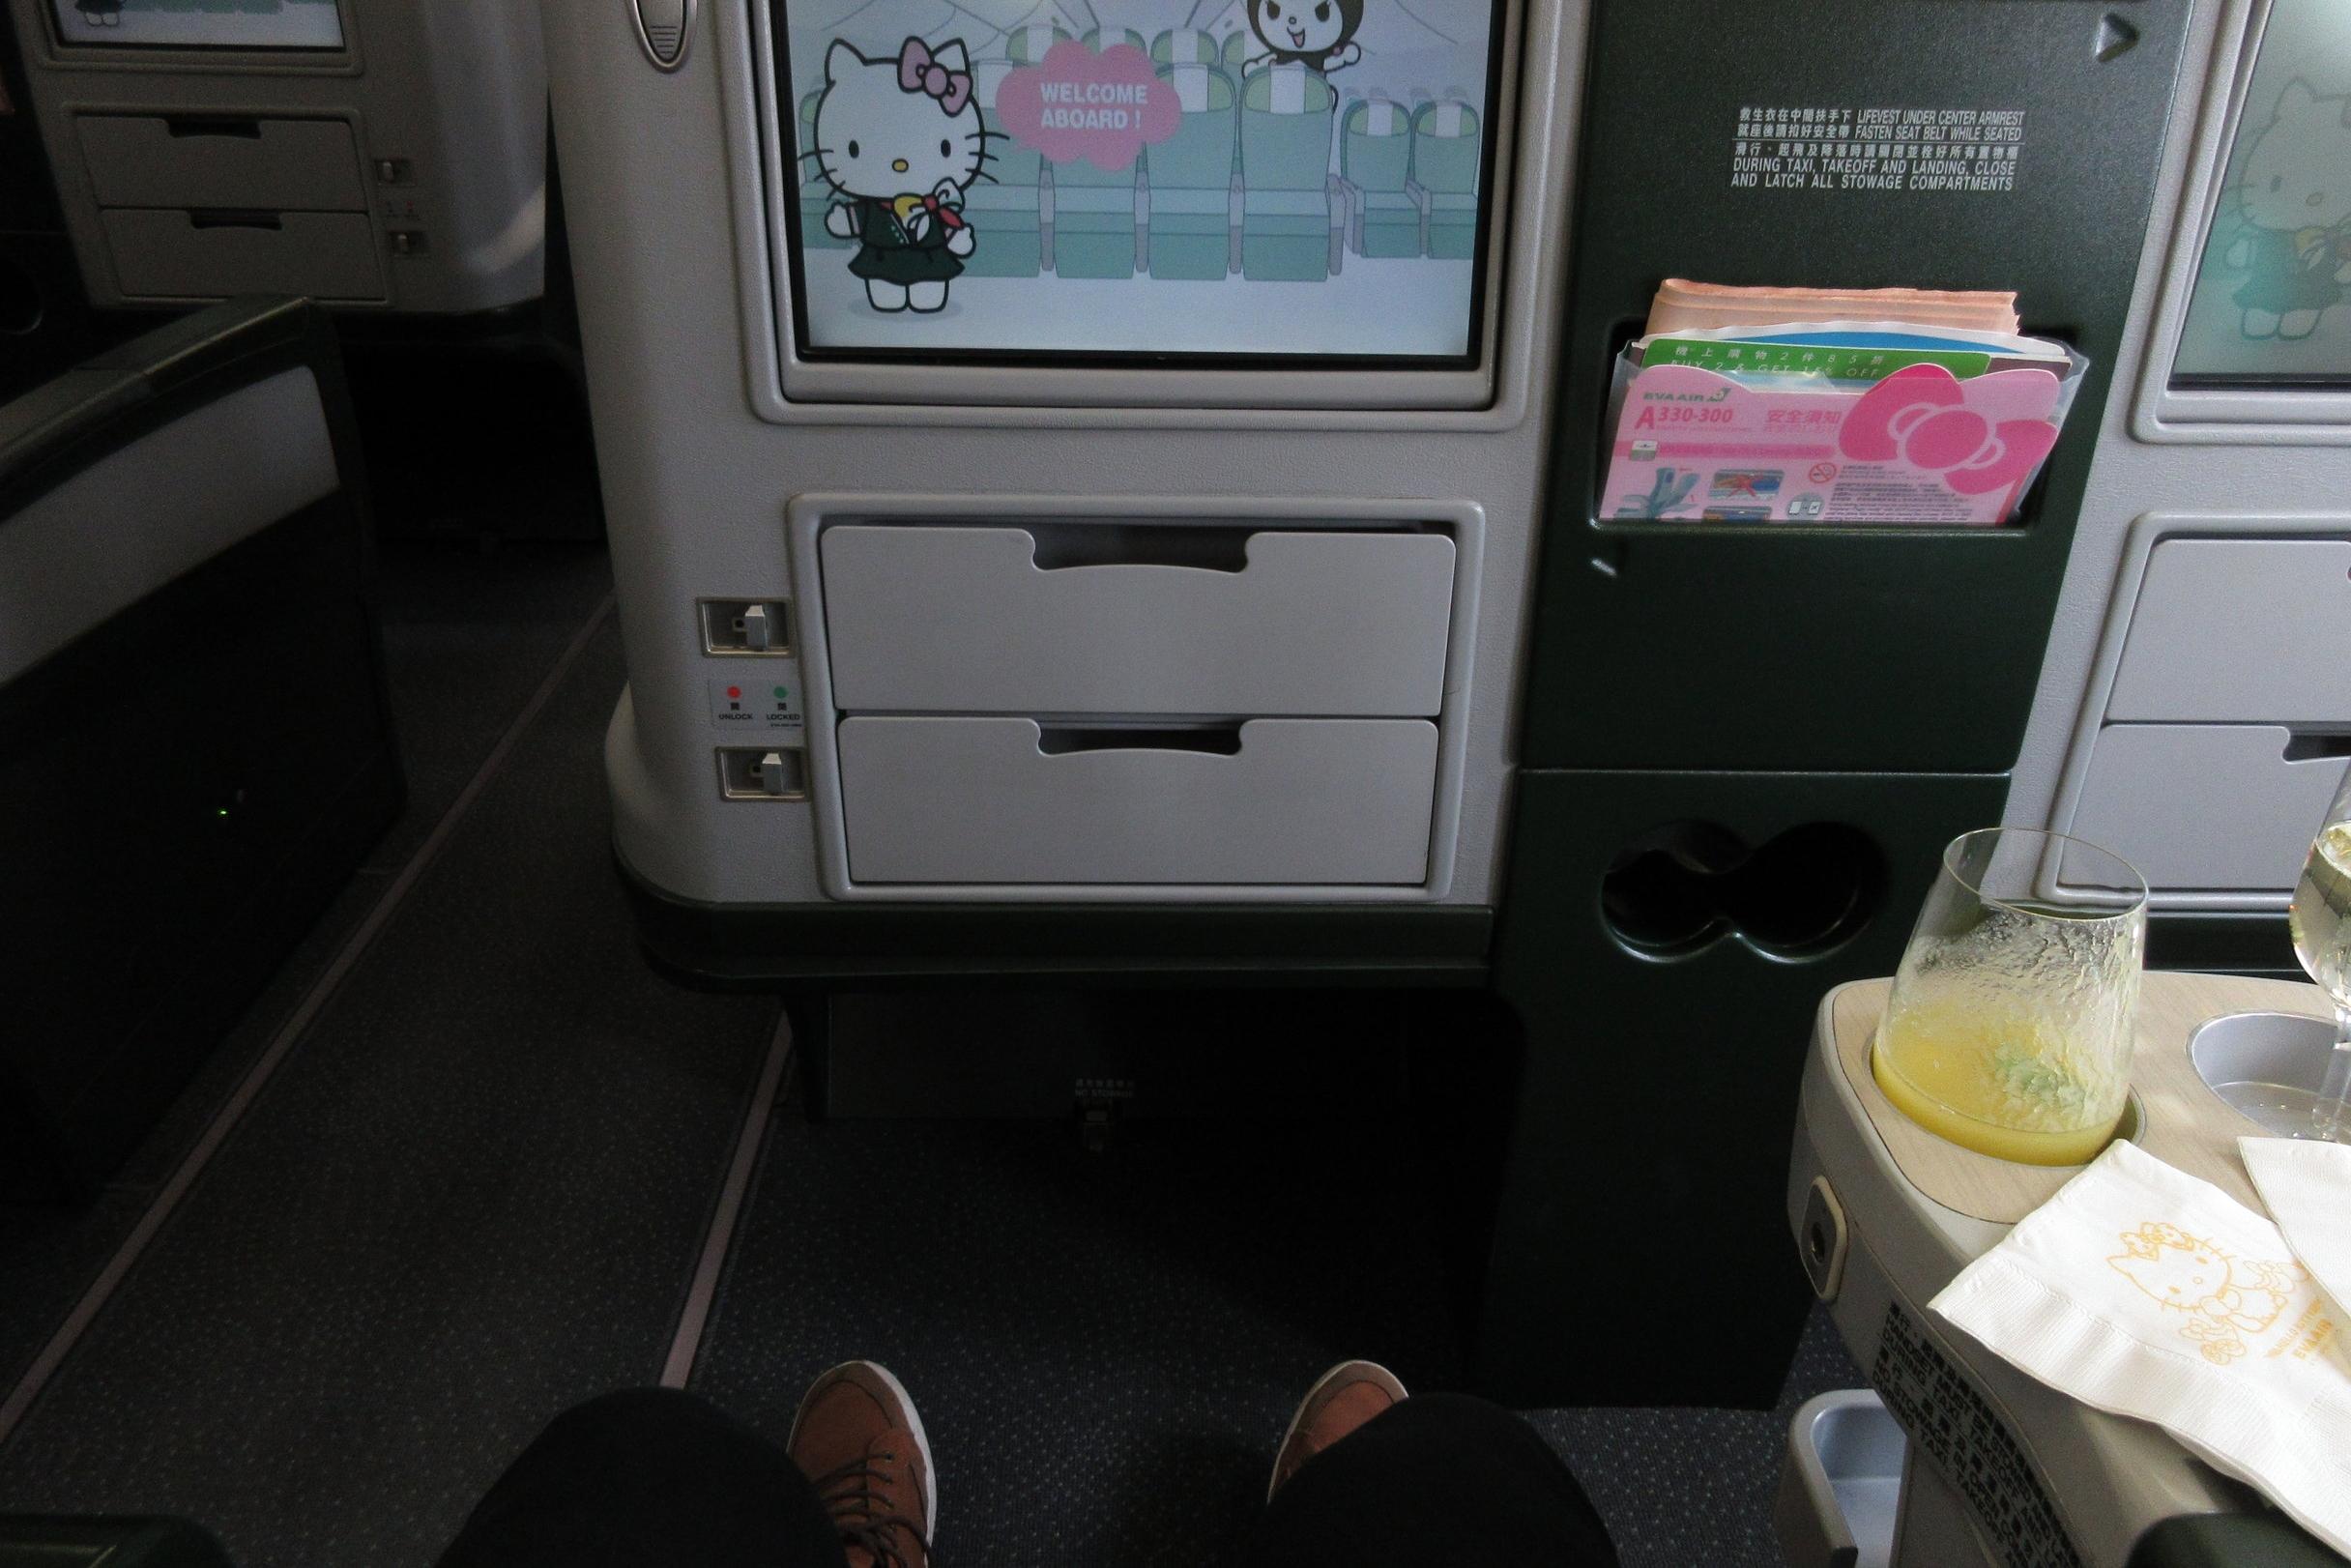 EVA Air regional business class – Legroom